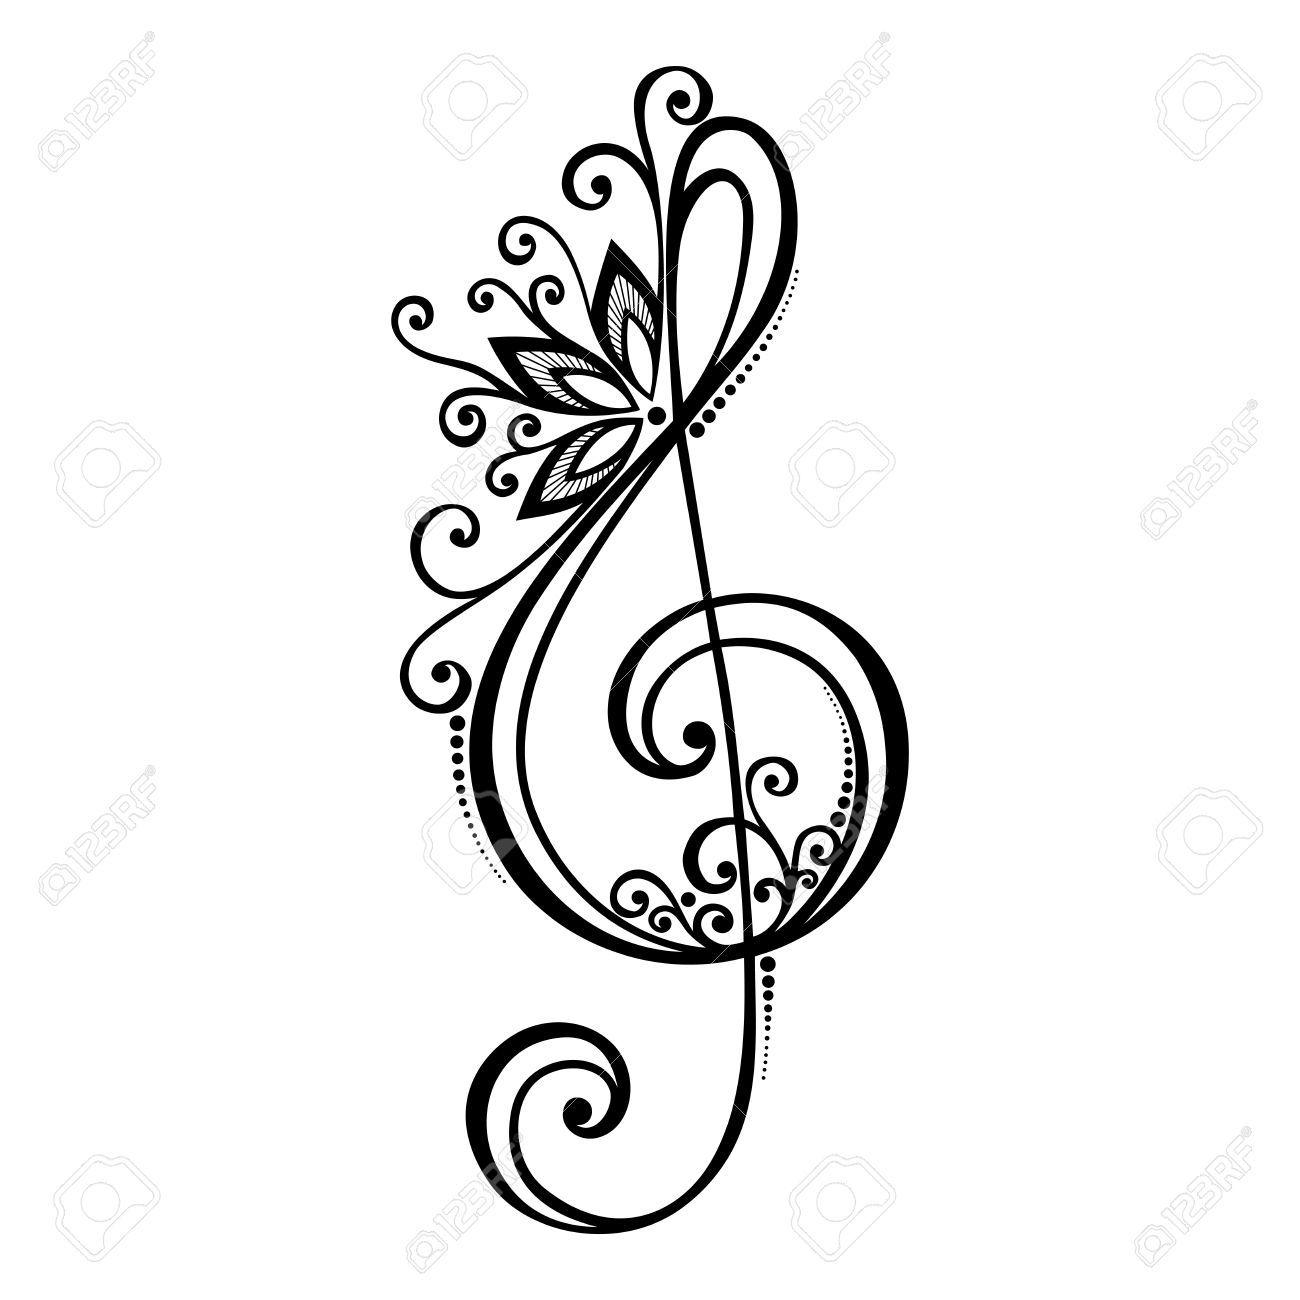 floral treble clef tattoos Google Search Tattoos